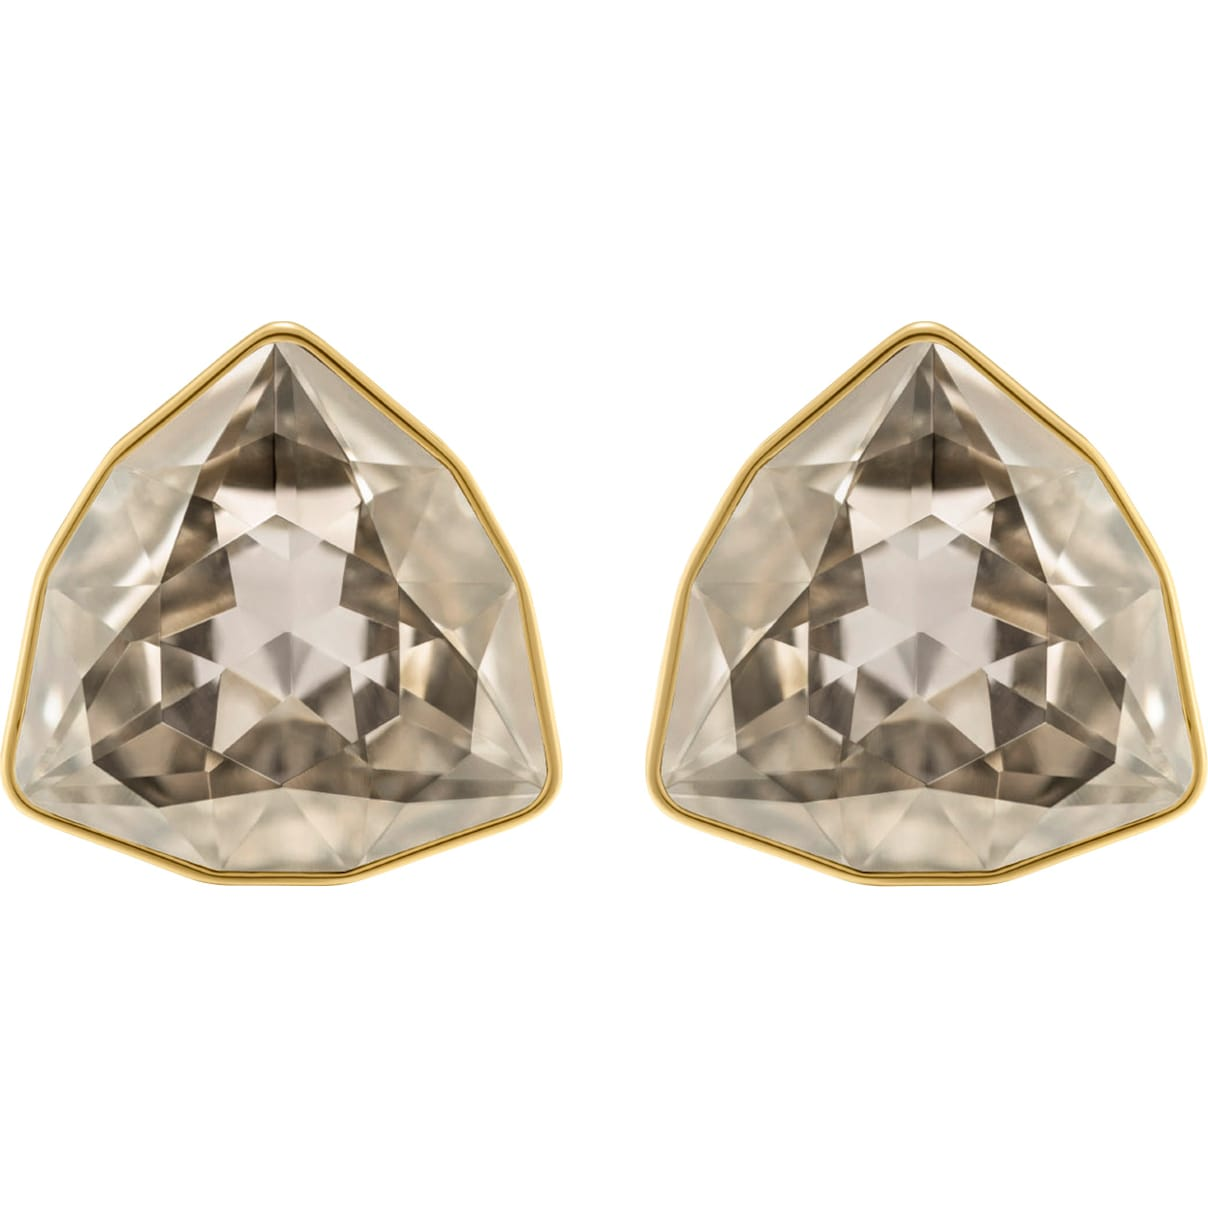 Swarovski March Fox Stud Pierced Earrings, Gray, Gold-tone plated